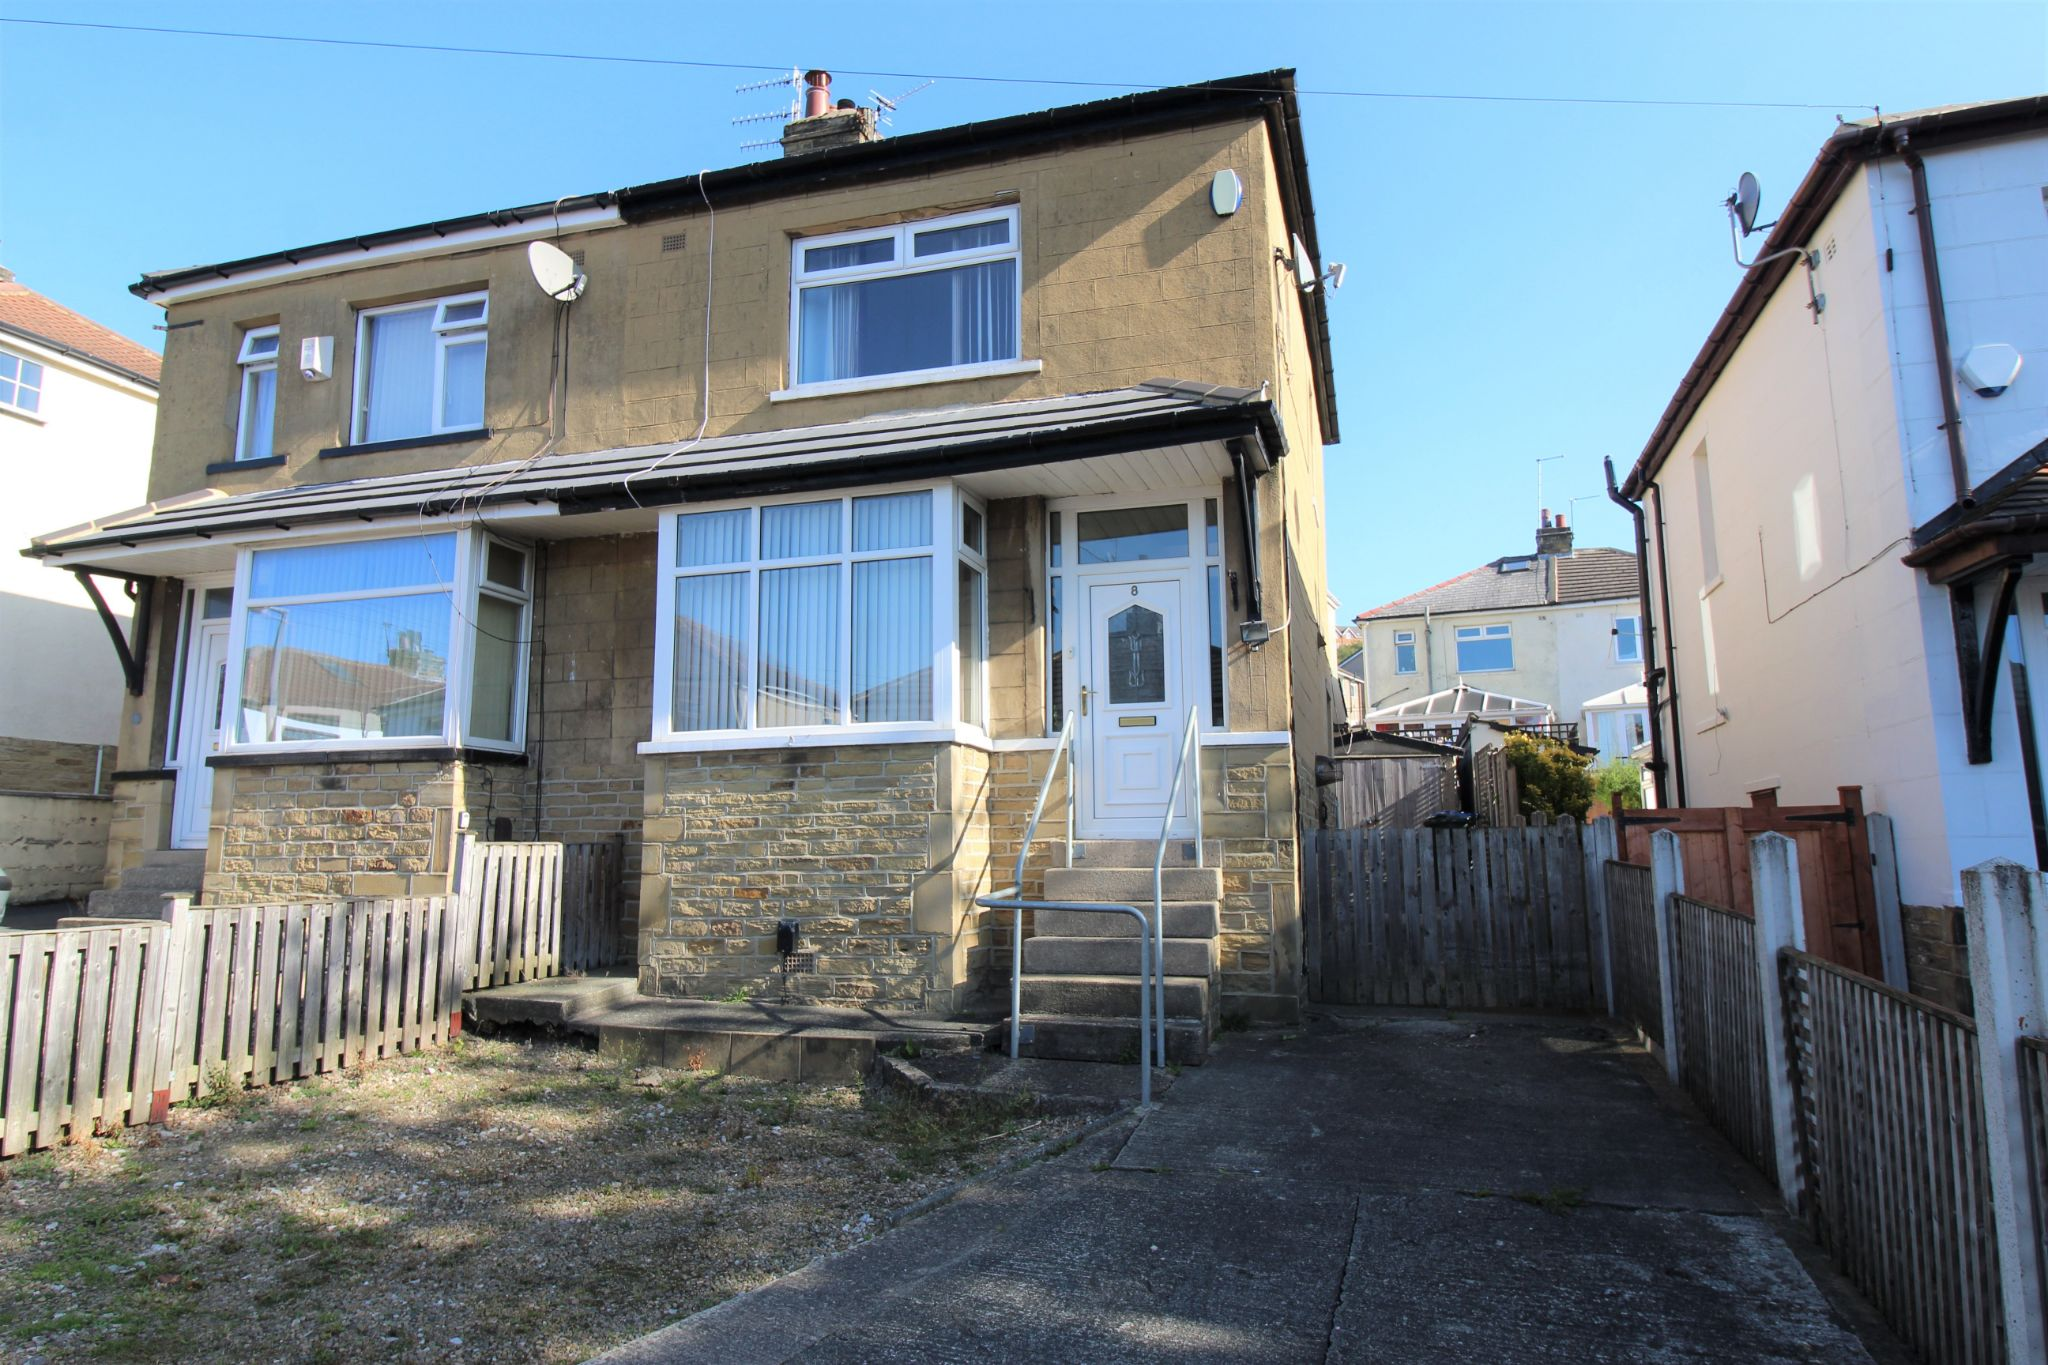 2 bedroom semi-detached house Let in Bradford - Front aspect